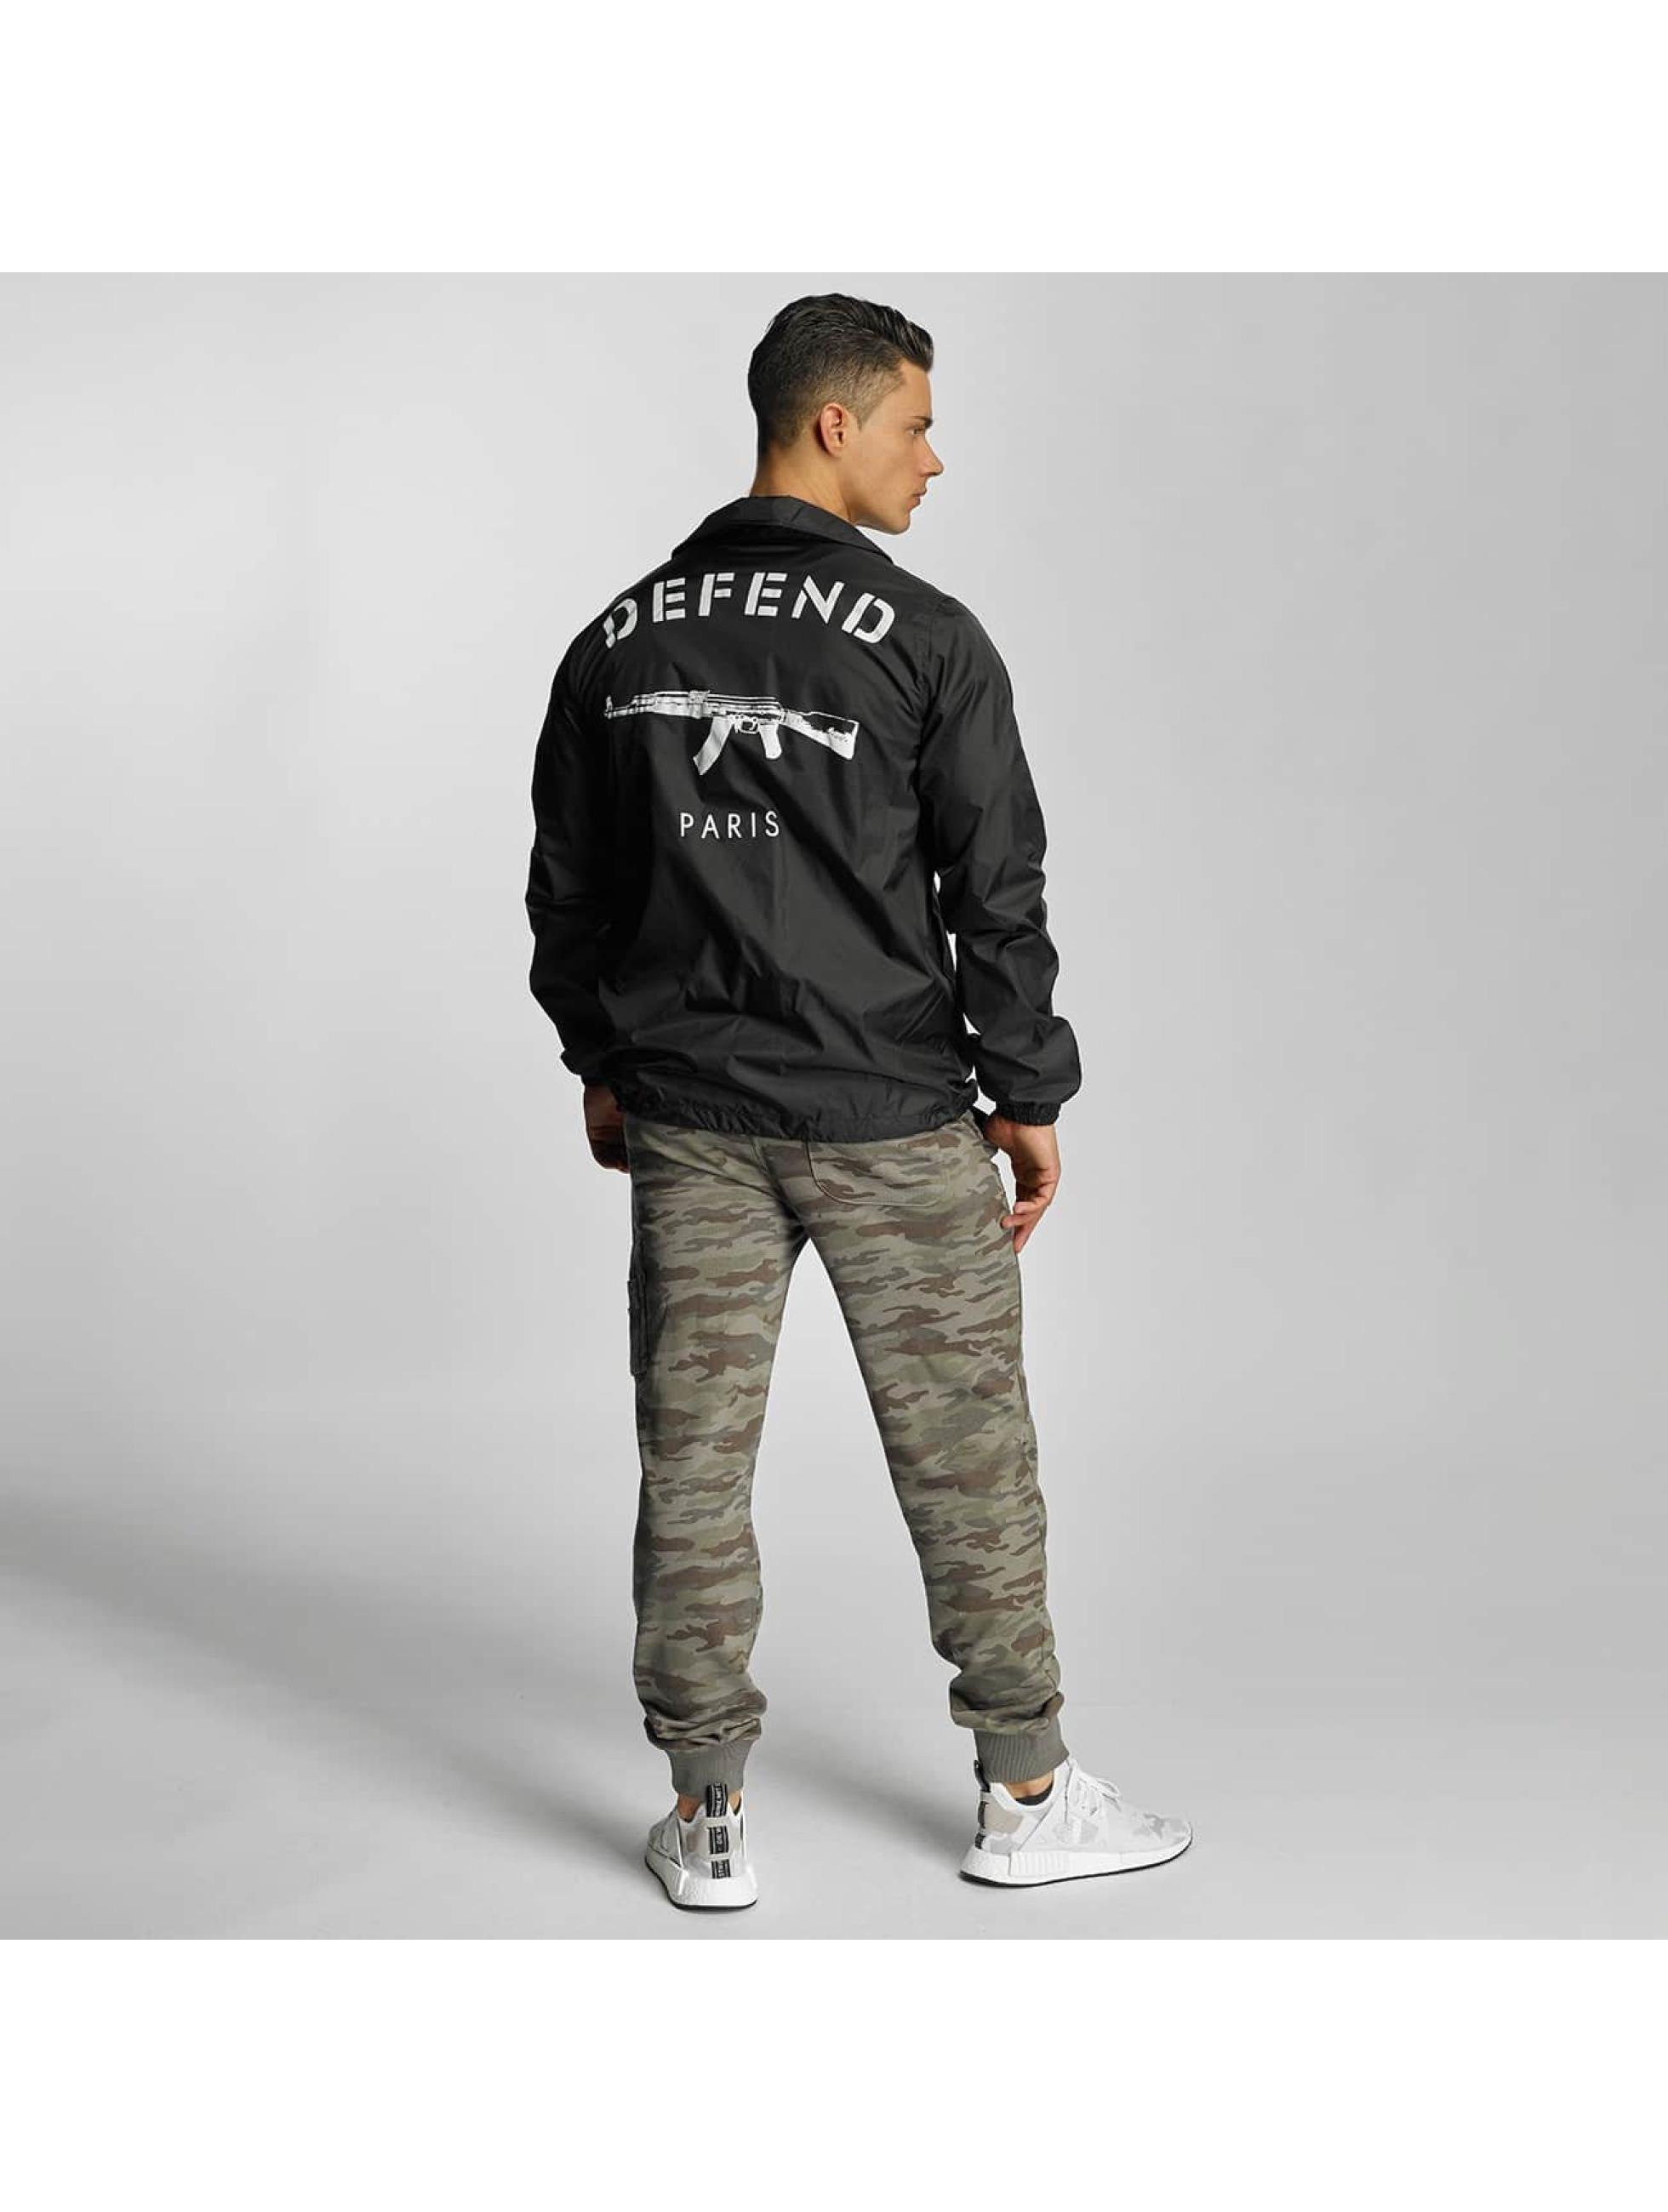 Defend Paris Lightweight Jacket Coat black